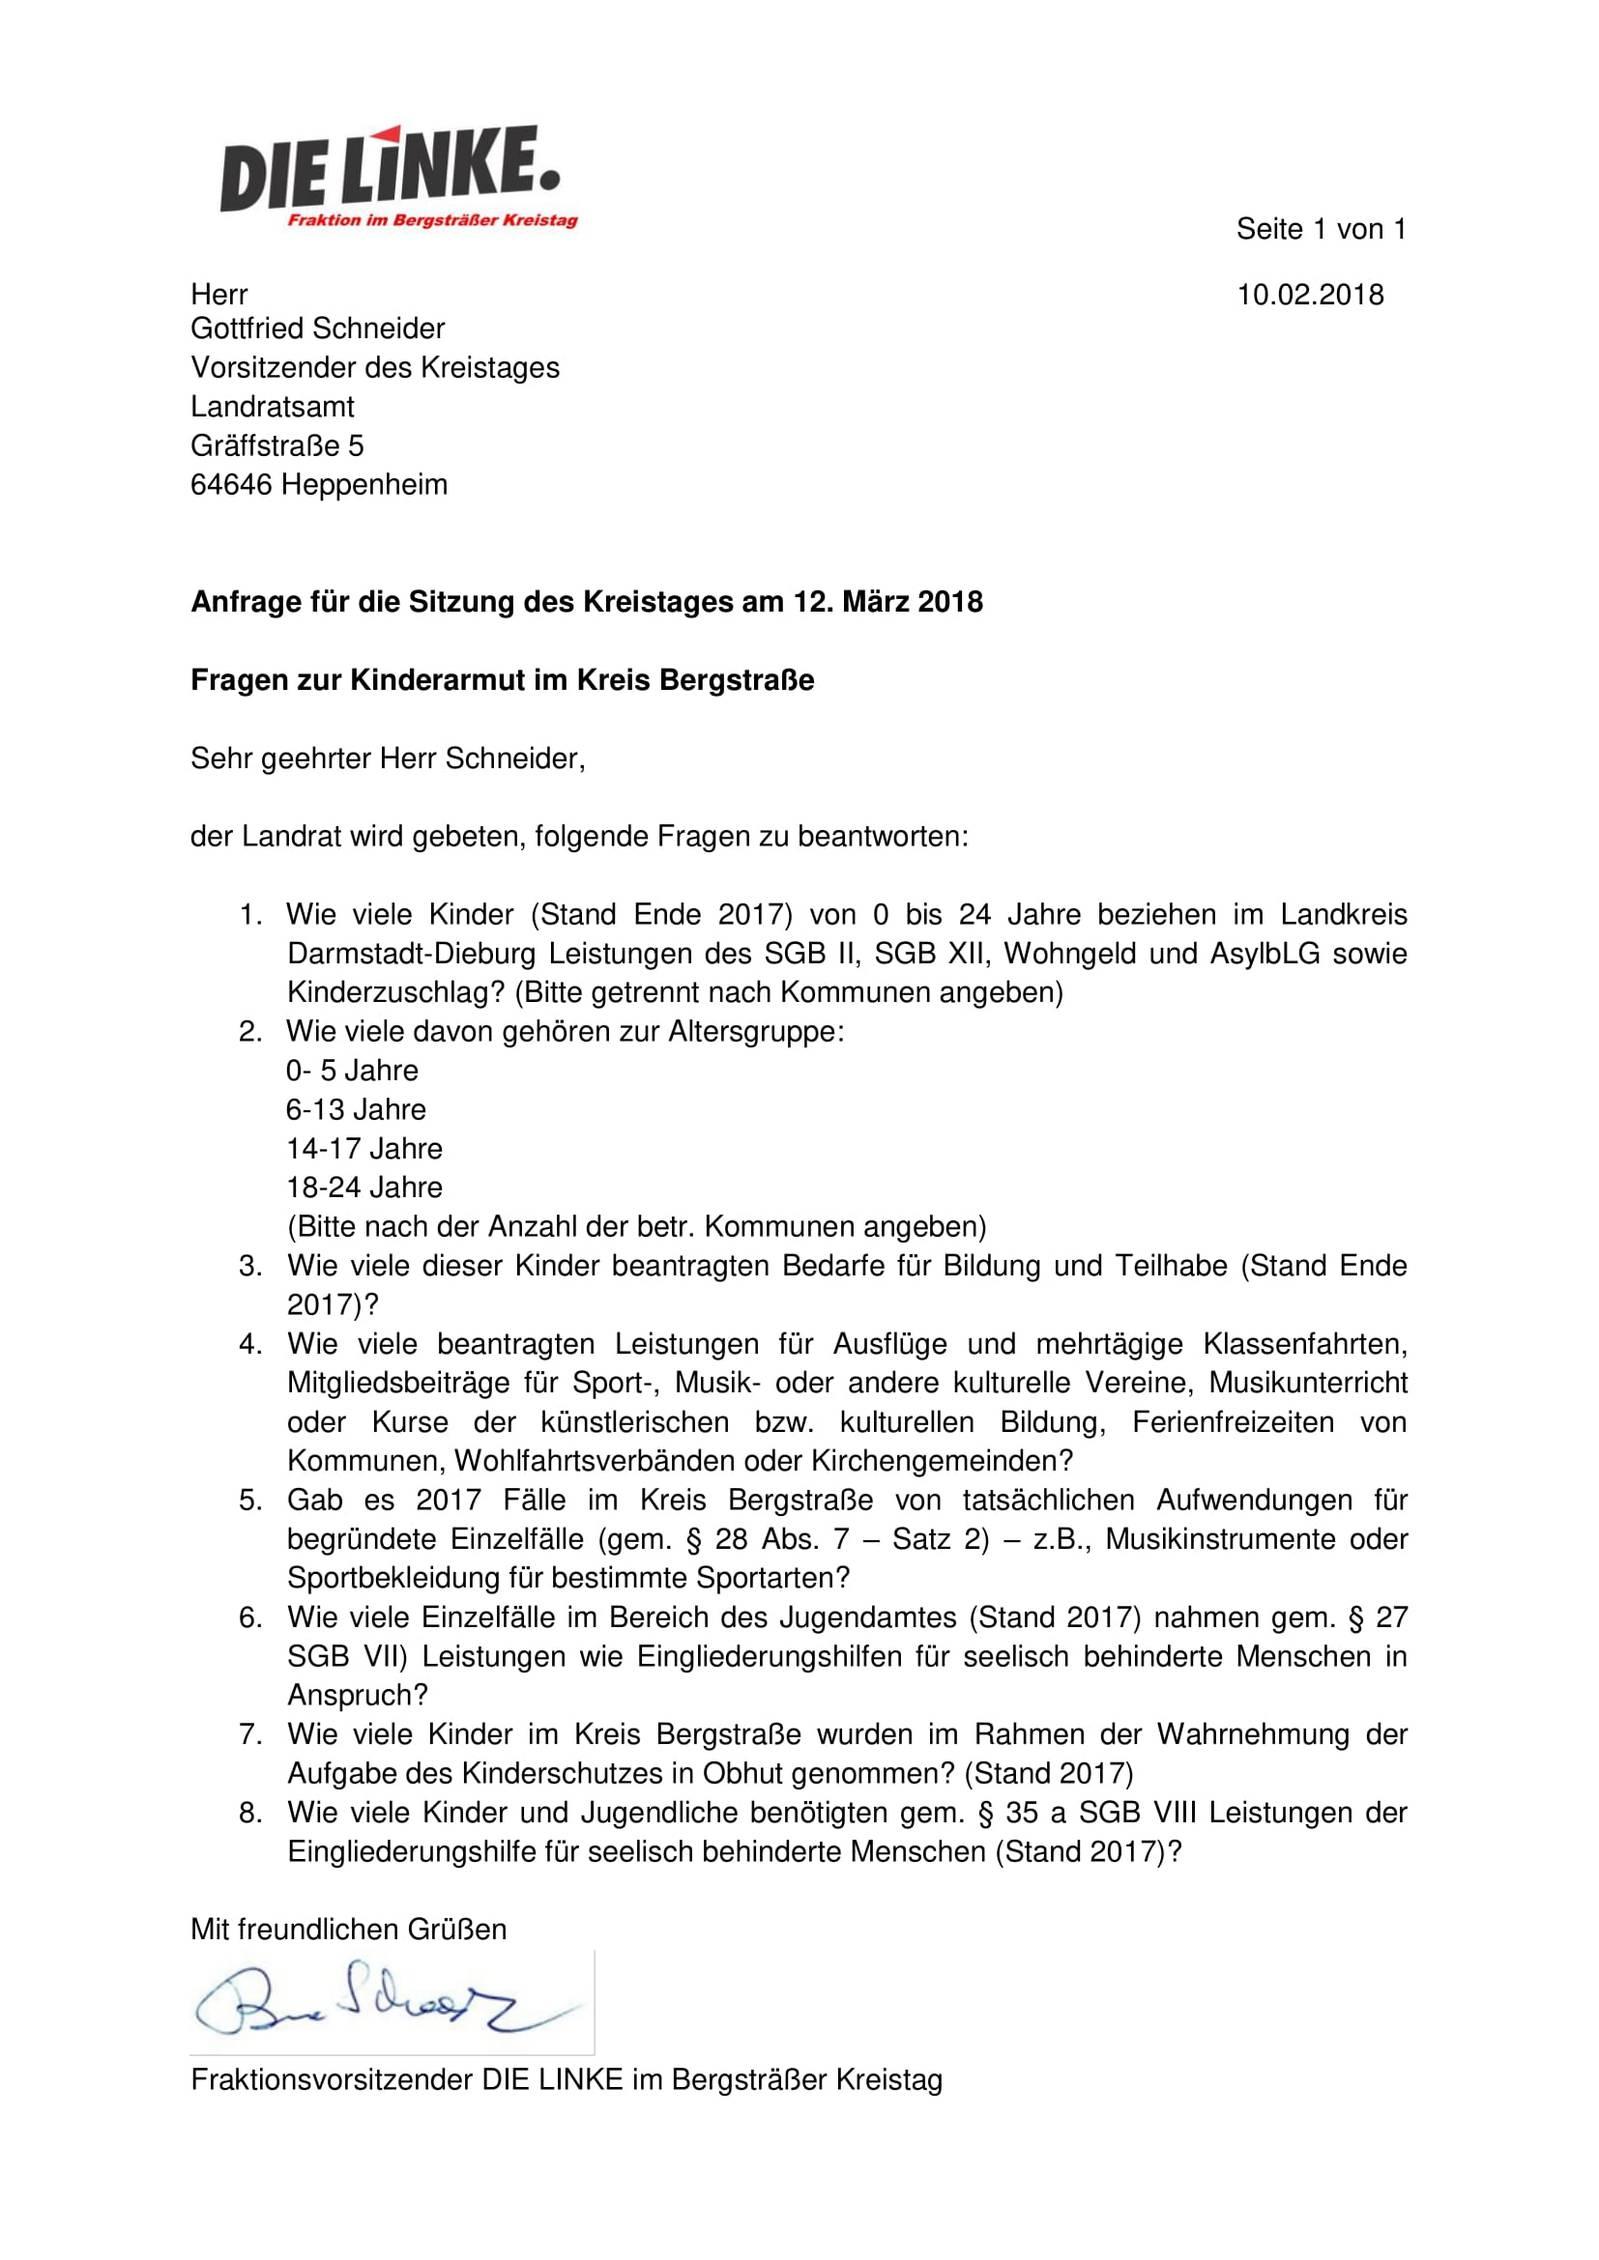 Atemberaubend Krankenhaus Job Lebenslauf Ziel Galerie - Entry Level ...